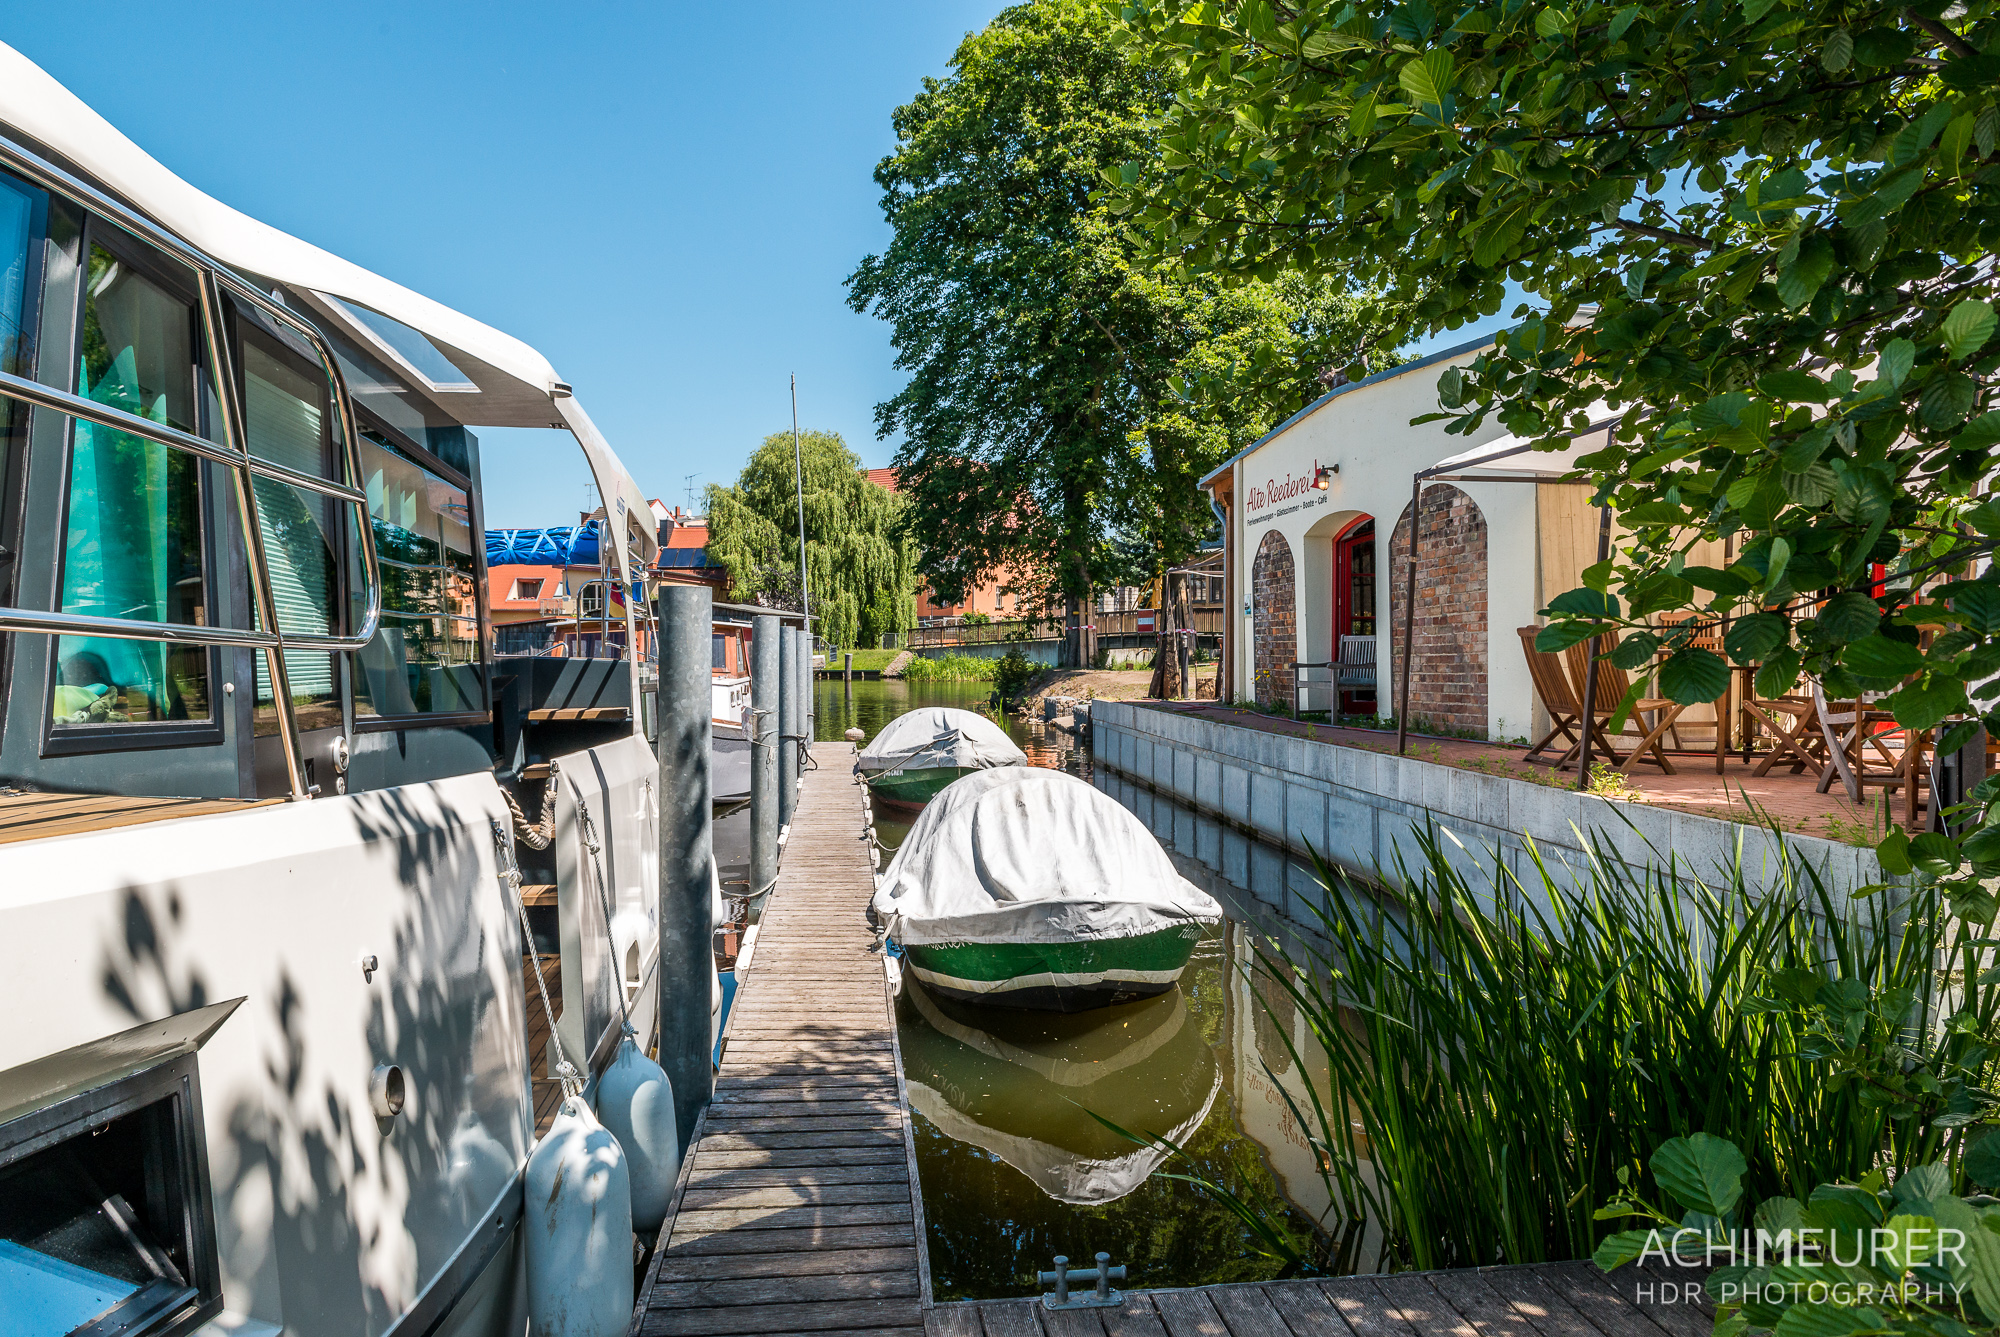 Hausboot-Kuhnle-Mueritz-Mecklenburg-Vorpommern-See_3161